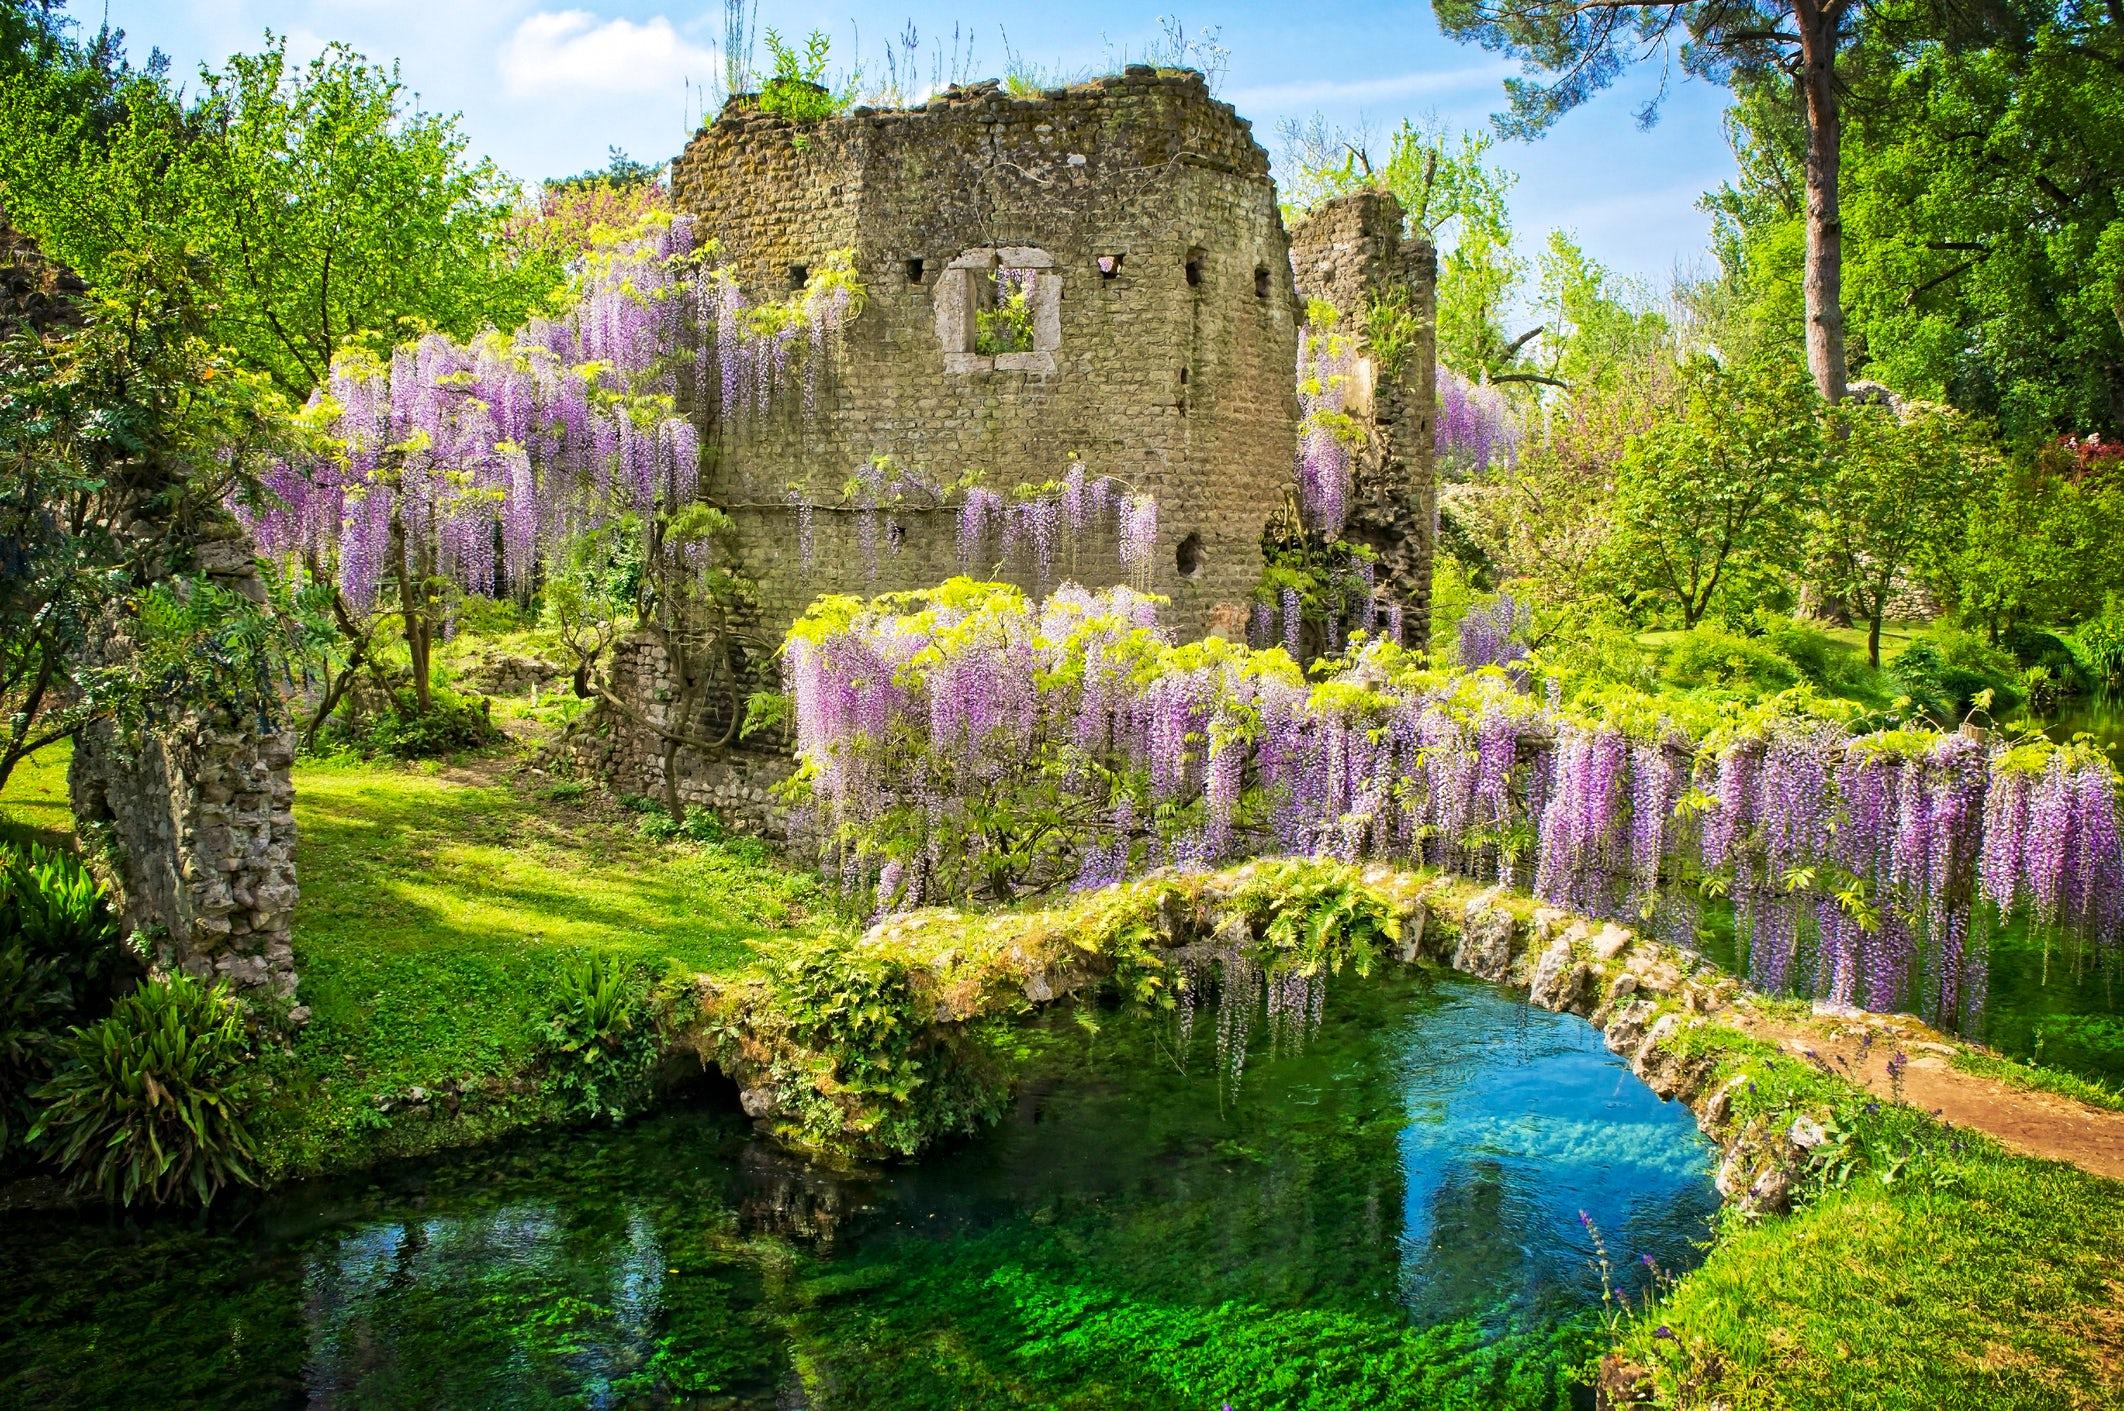 A Magic Garden: Il Giardino di Ninfa